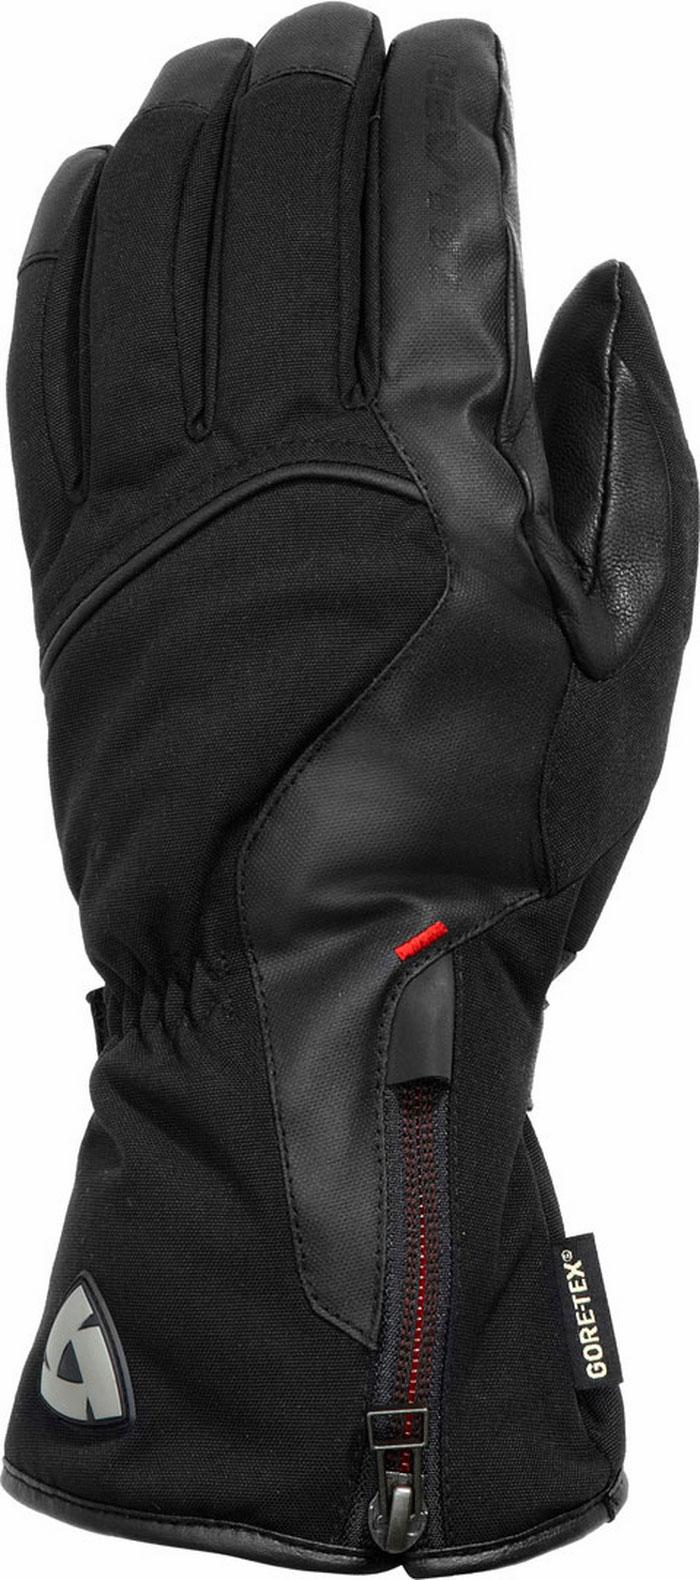 REV'IT! Milano GTX Winter Gloves